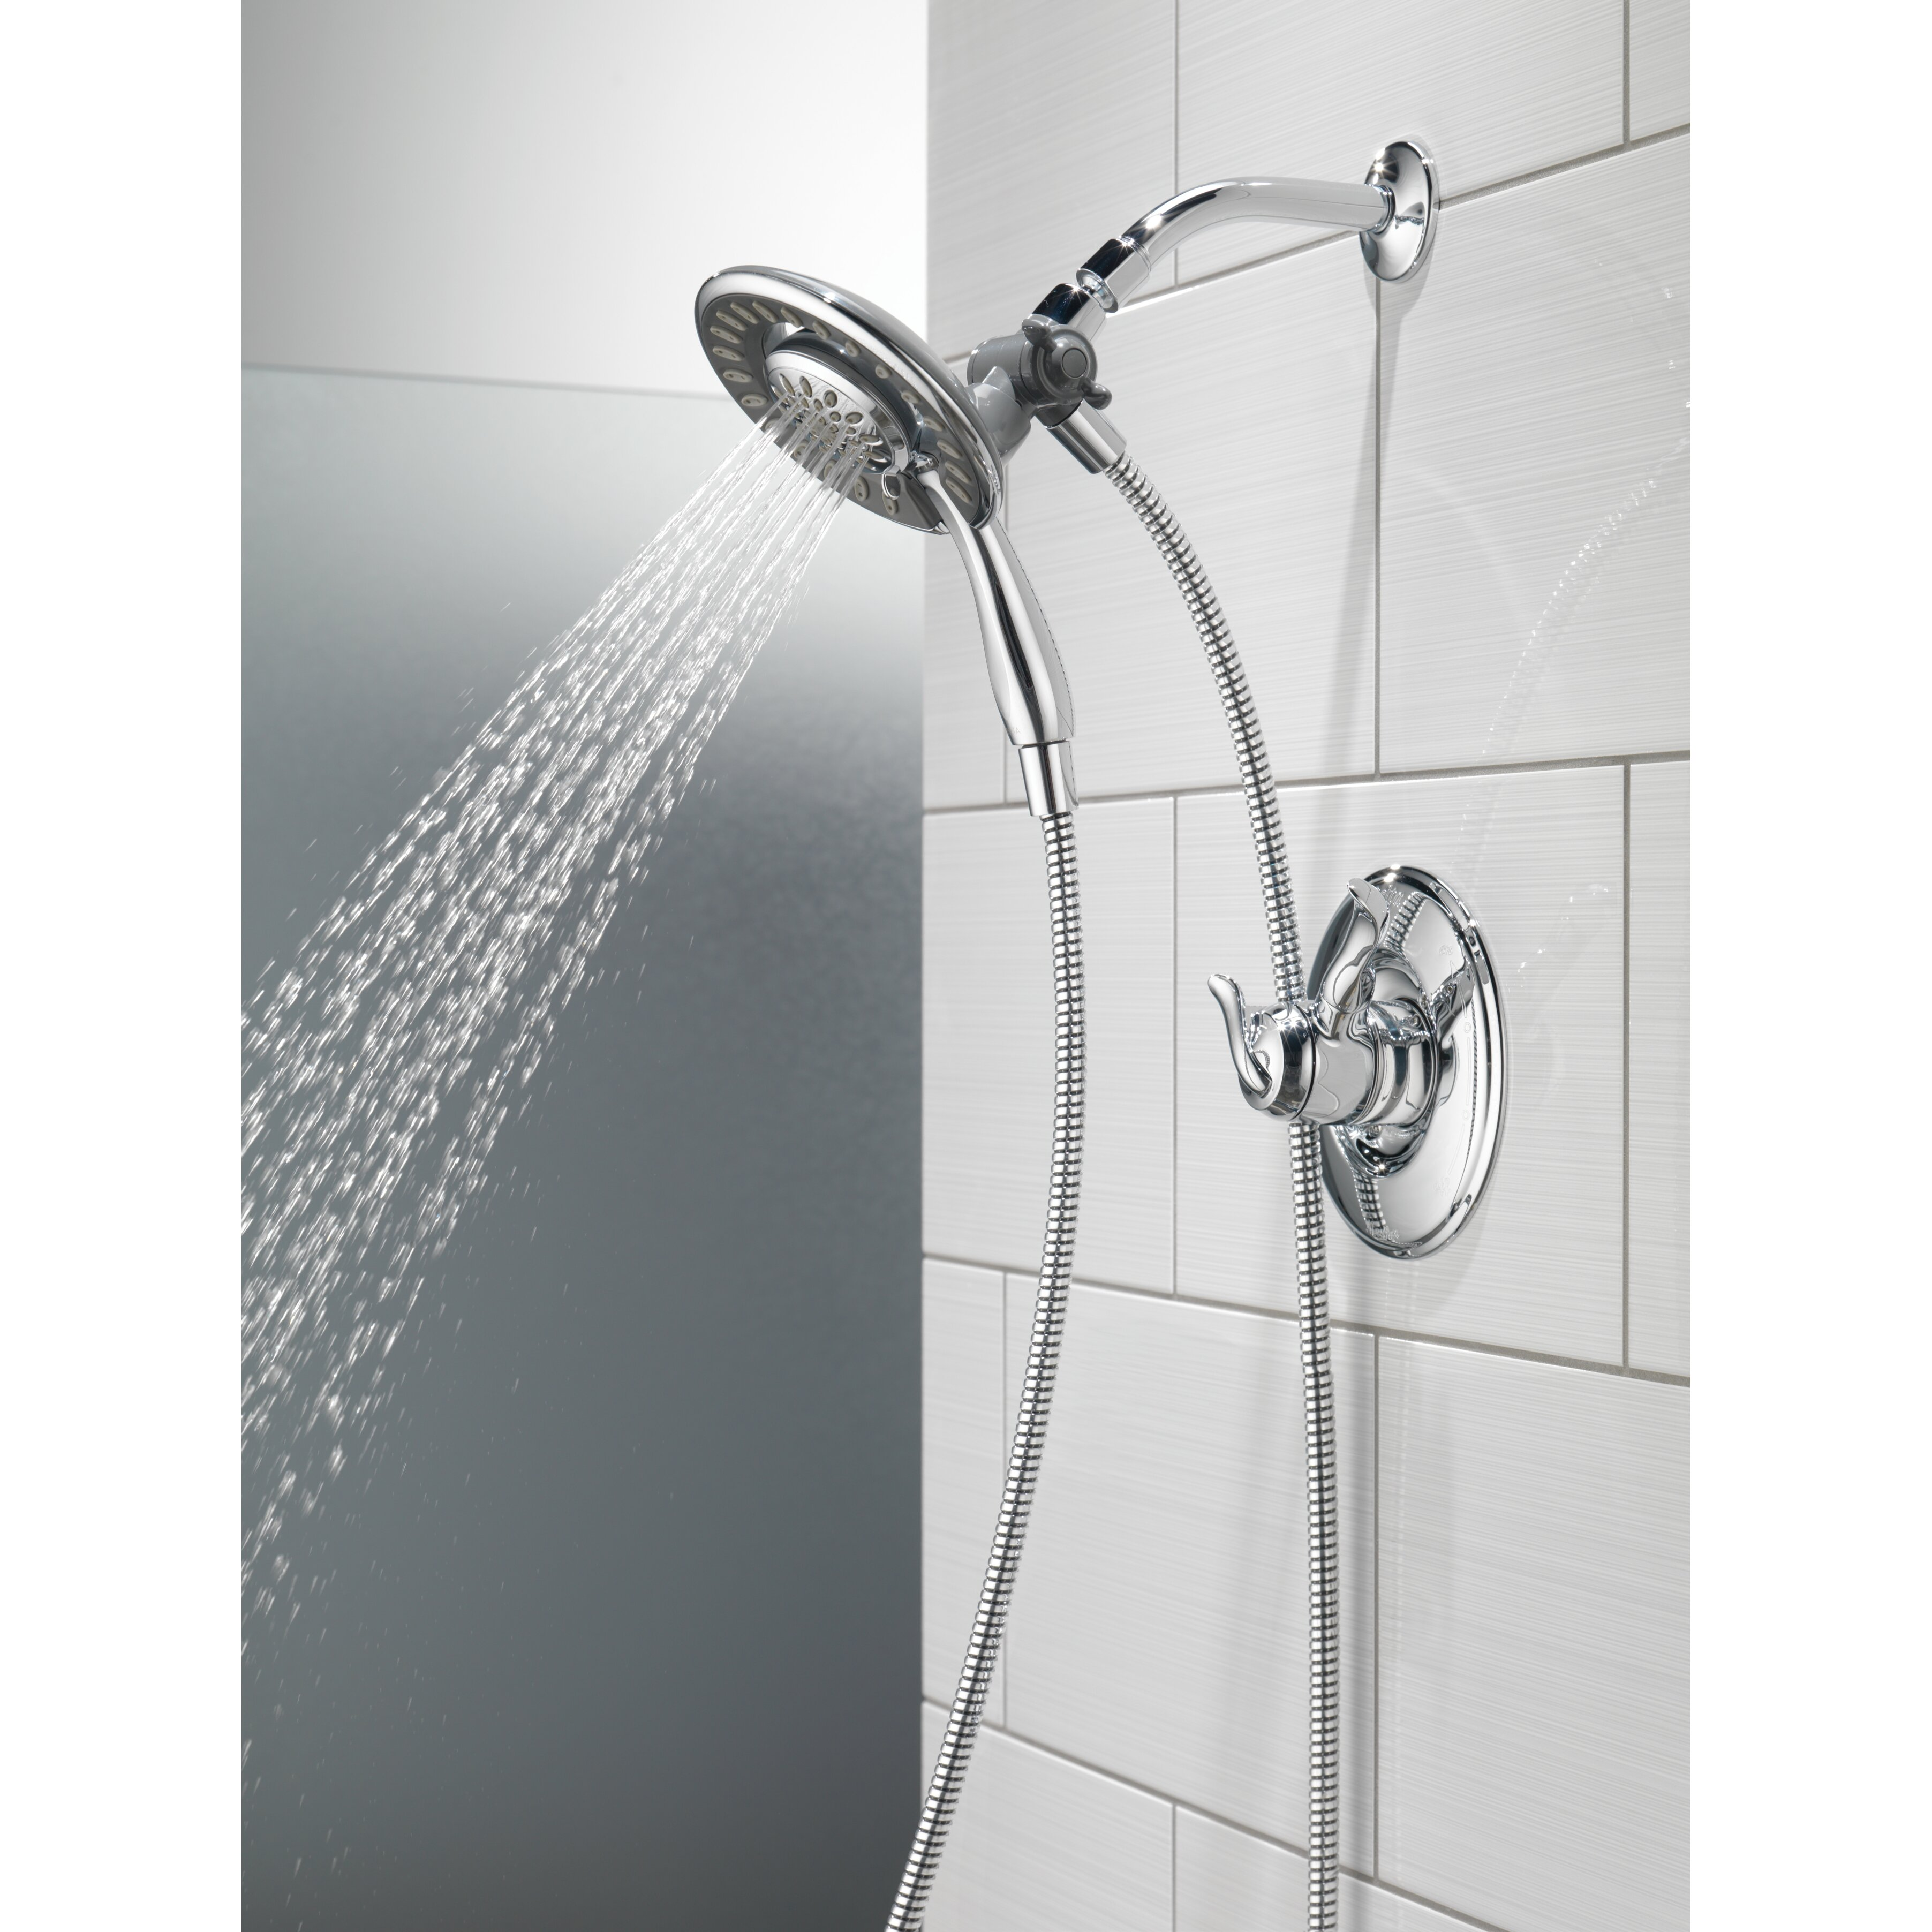 Delta linden dual function complete shower system reviews for Delta bathroom shower systems